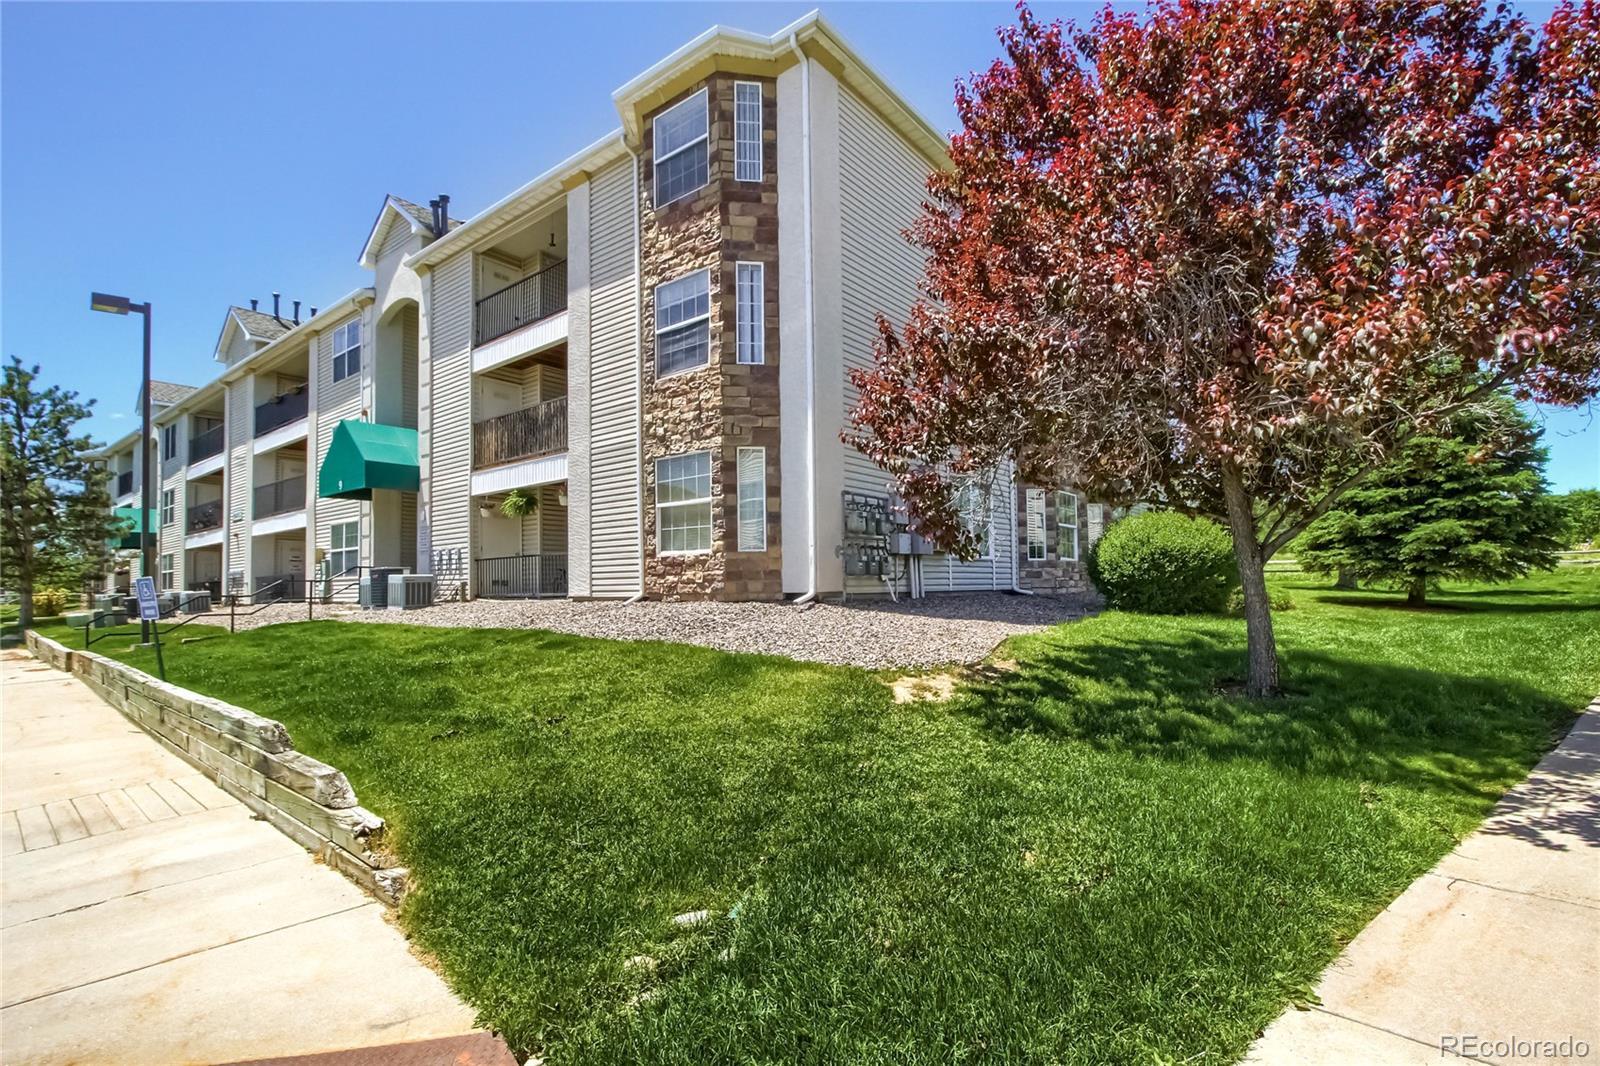 MLS# 8175765 - 2 - 12338 W Dorado Place #201, Littleton, CO 80127